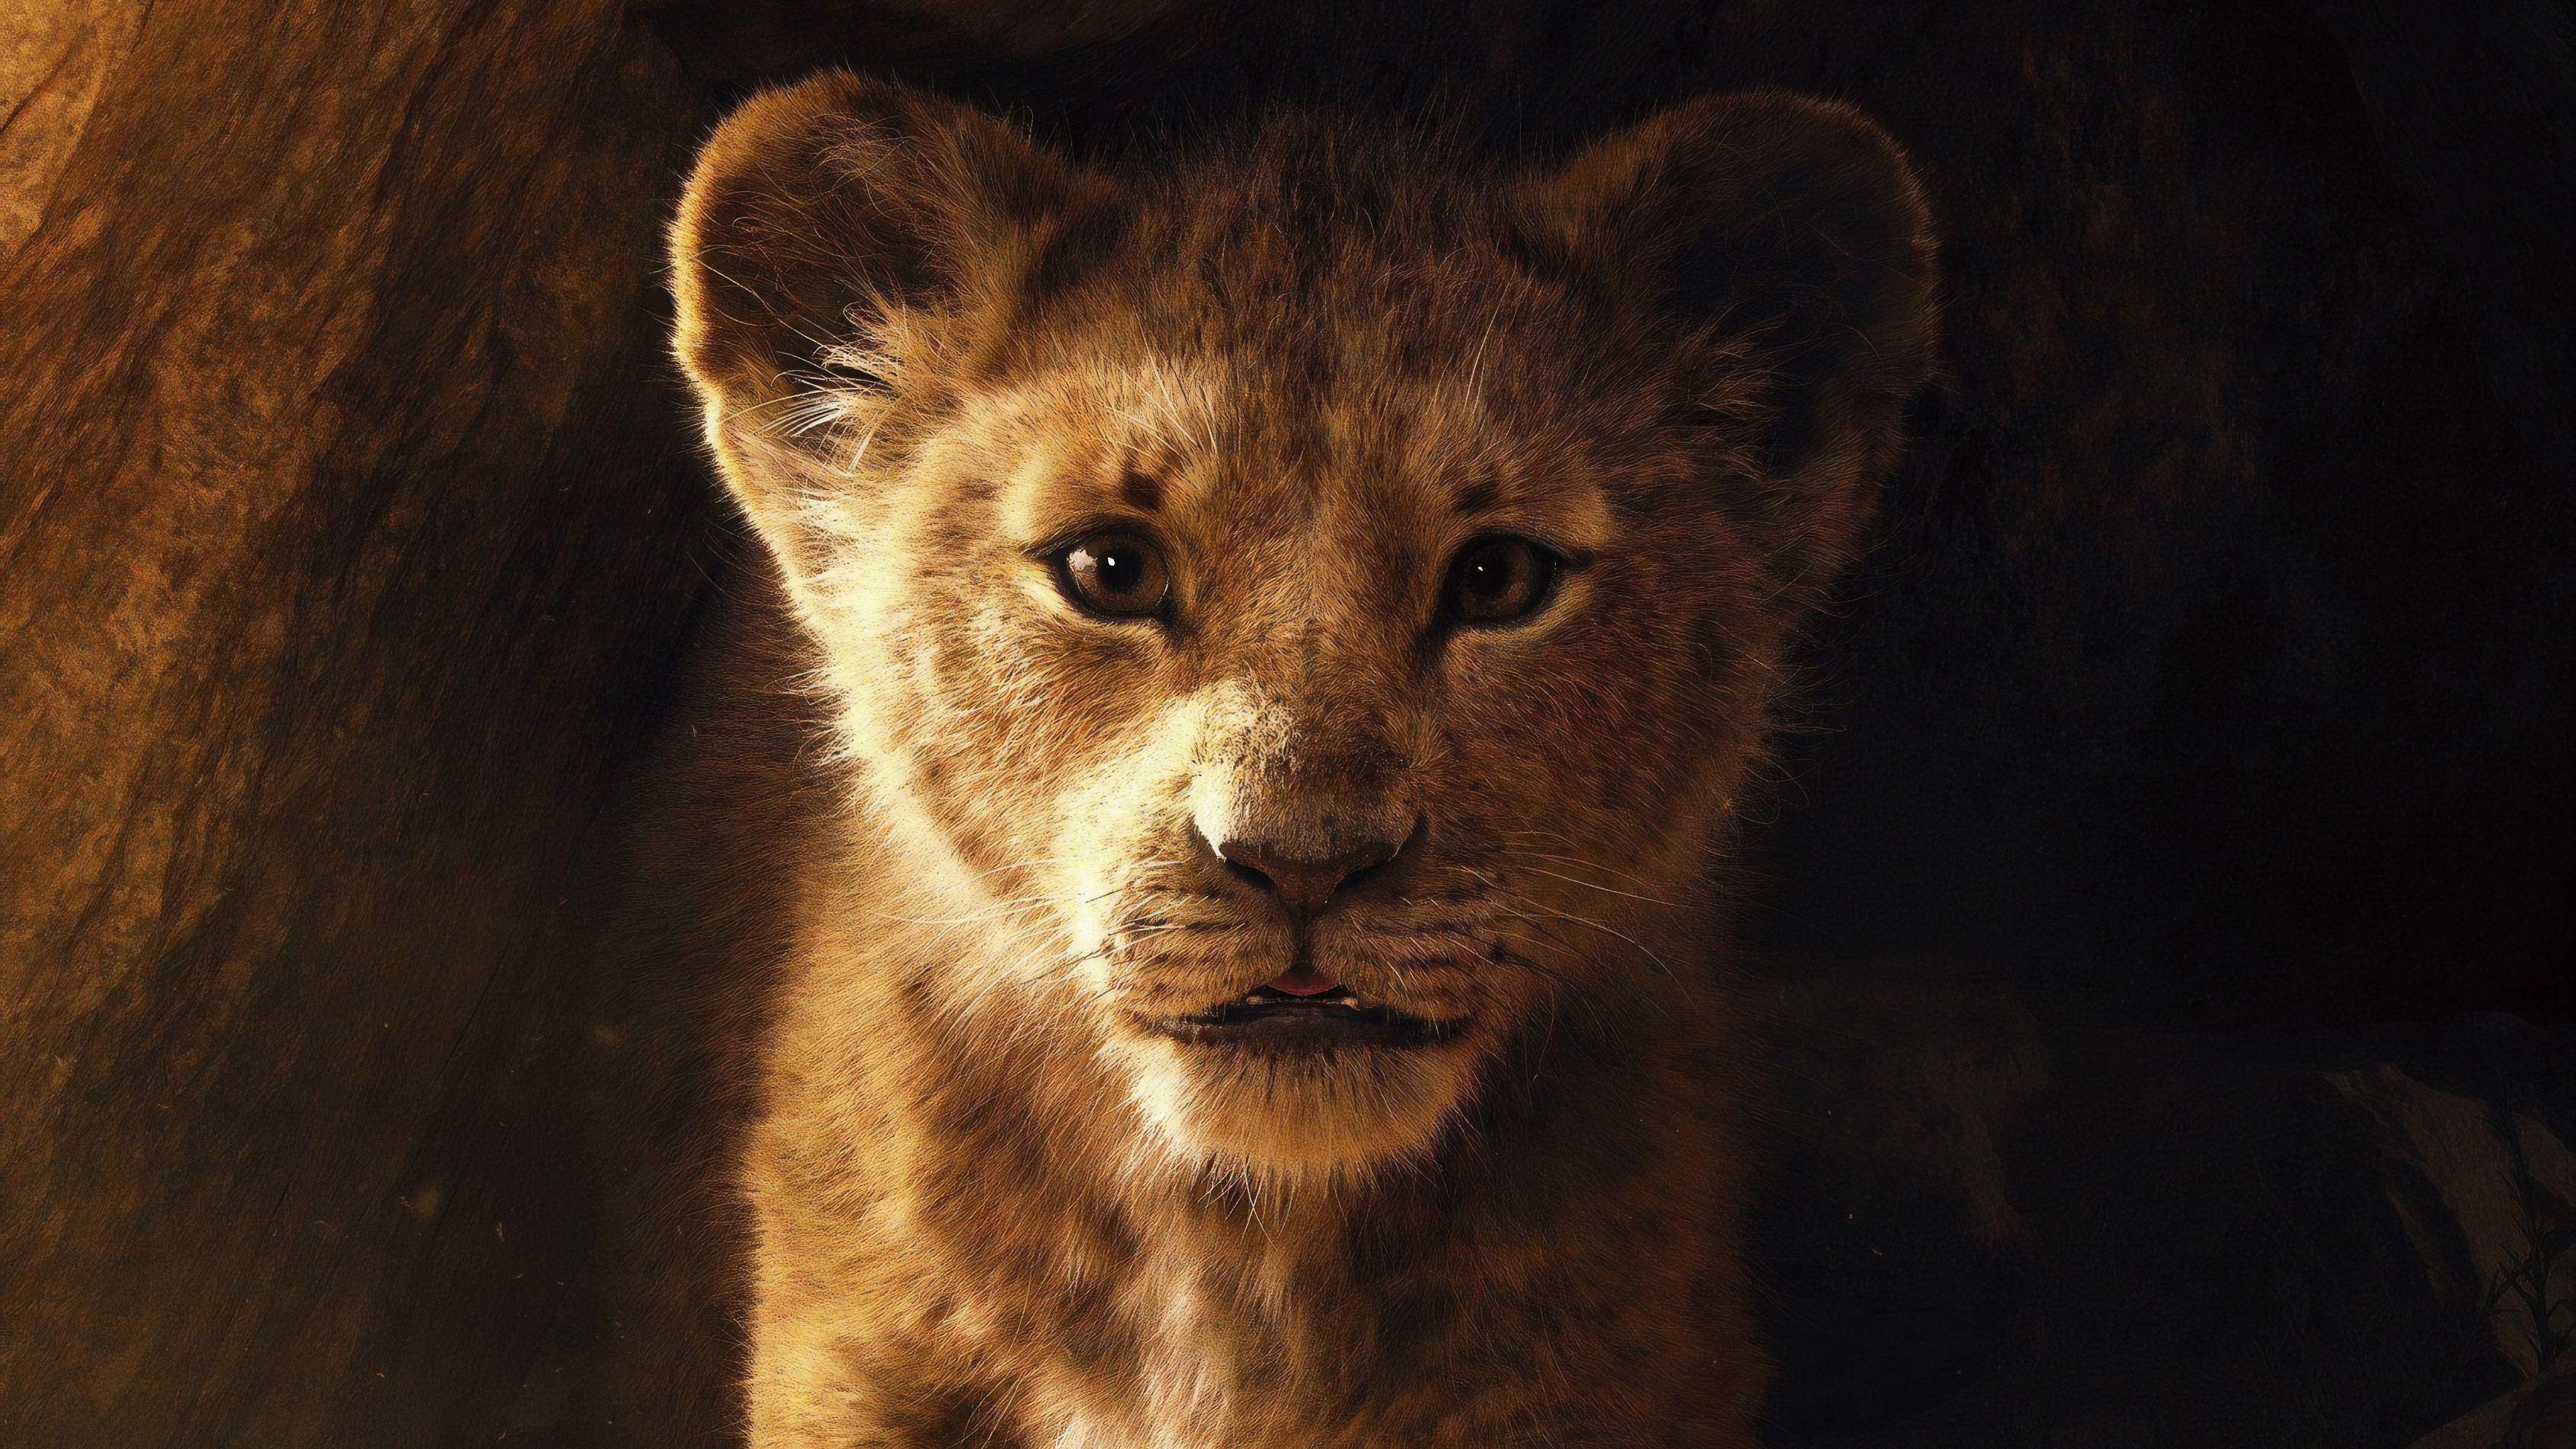 The Lion King 2019 5k King Lion The 2019 5k Wallpaper Hdwallpaper Desktop Lion King Movie The Lion King Characters Lion King